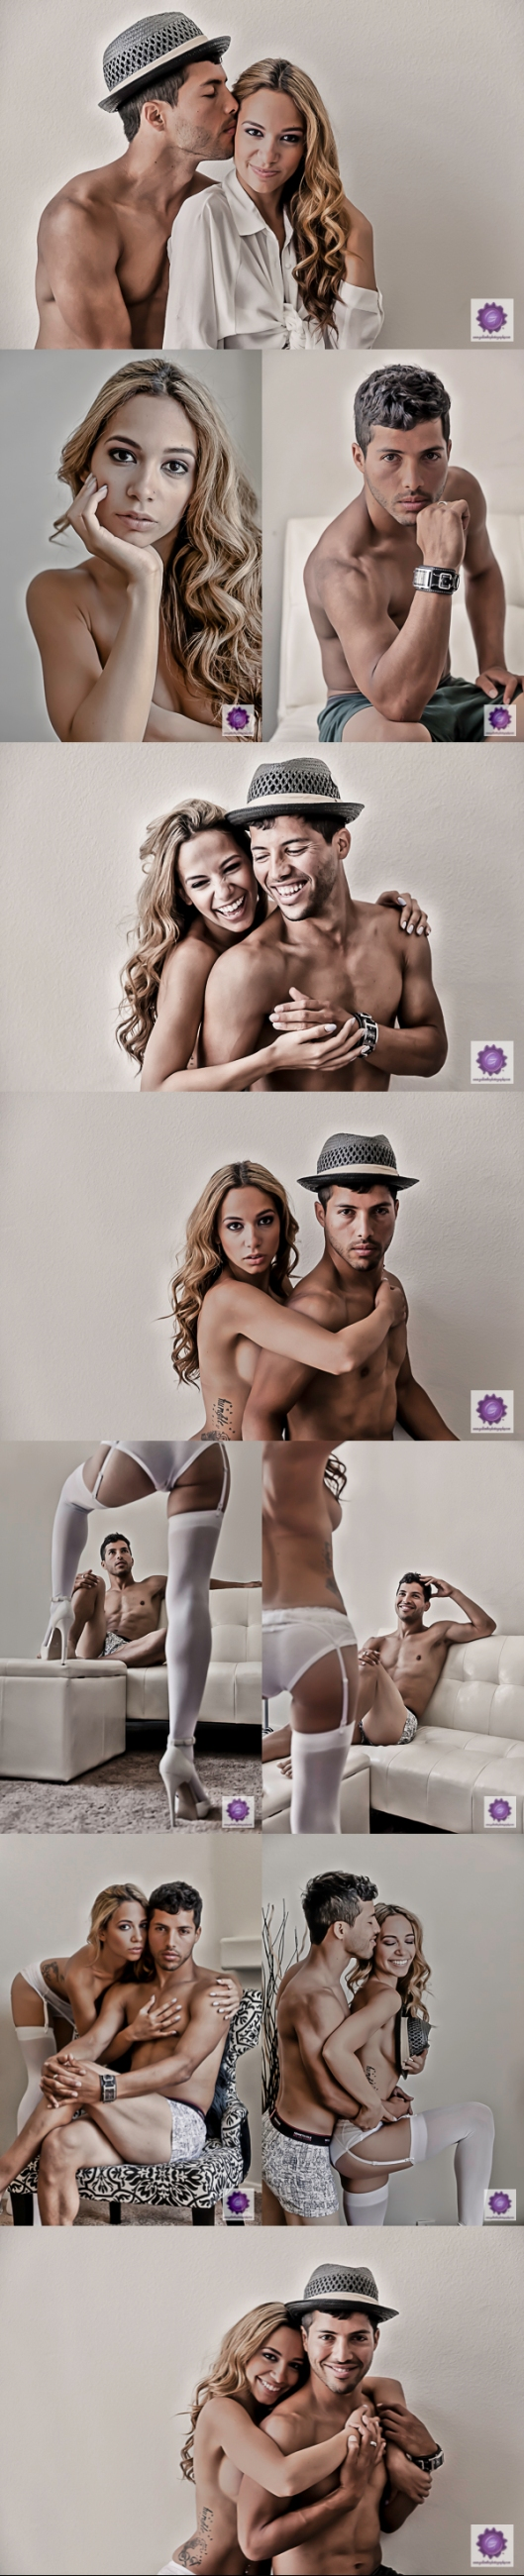 los angeles boudoir photography-2